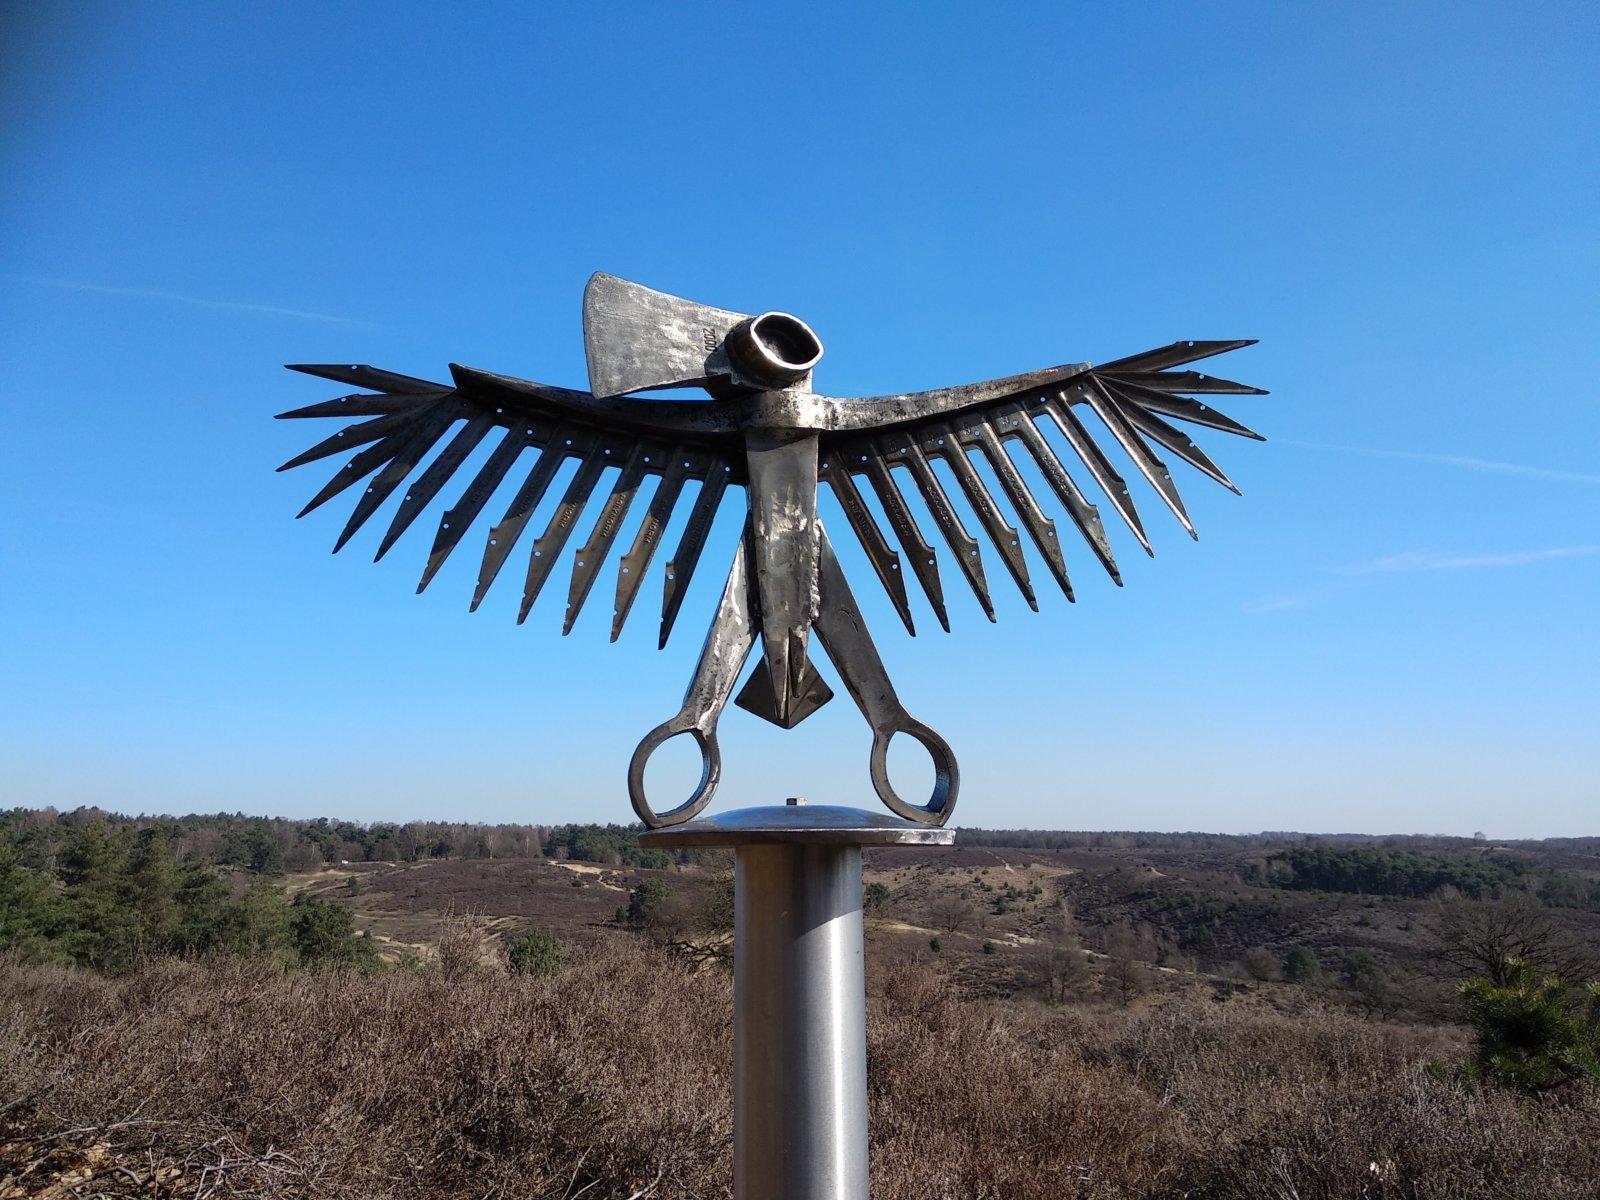 Animalized Iron Eagle Recycle Art Hubert Van Soest Decreatievelink Netherlands